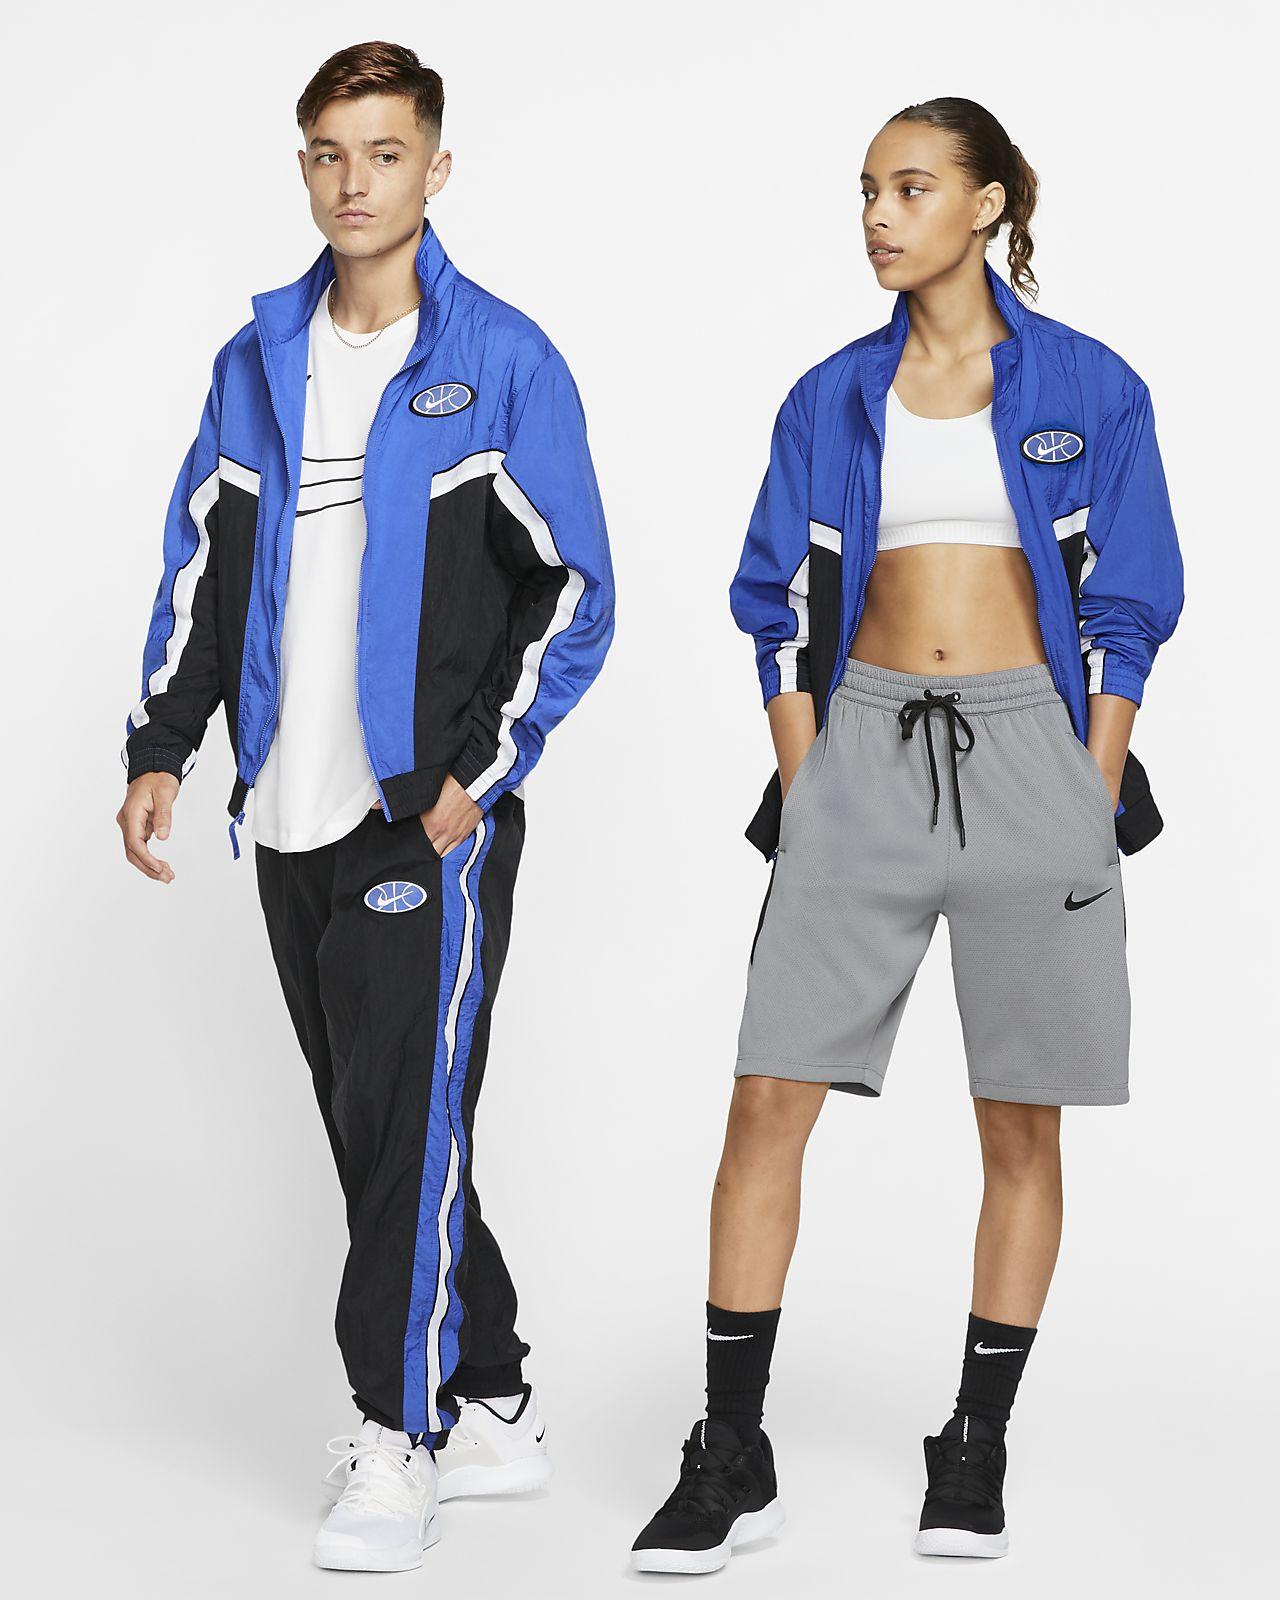 Vintage 90s Nike Women's Full Zip Polyester Jacket